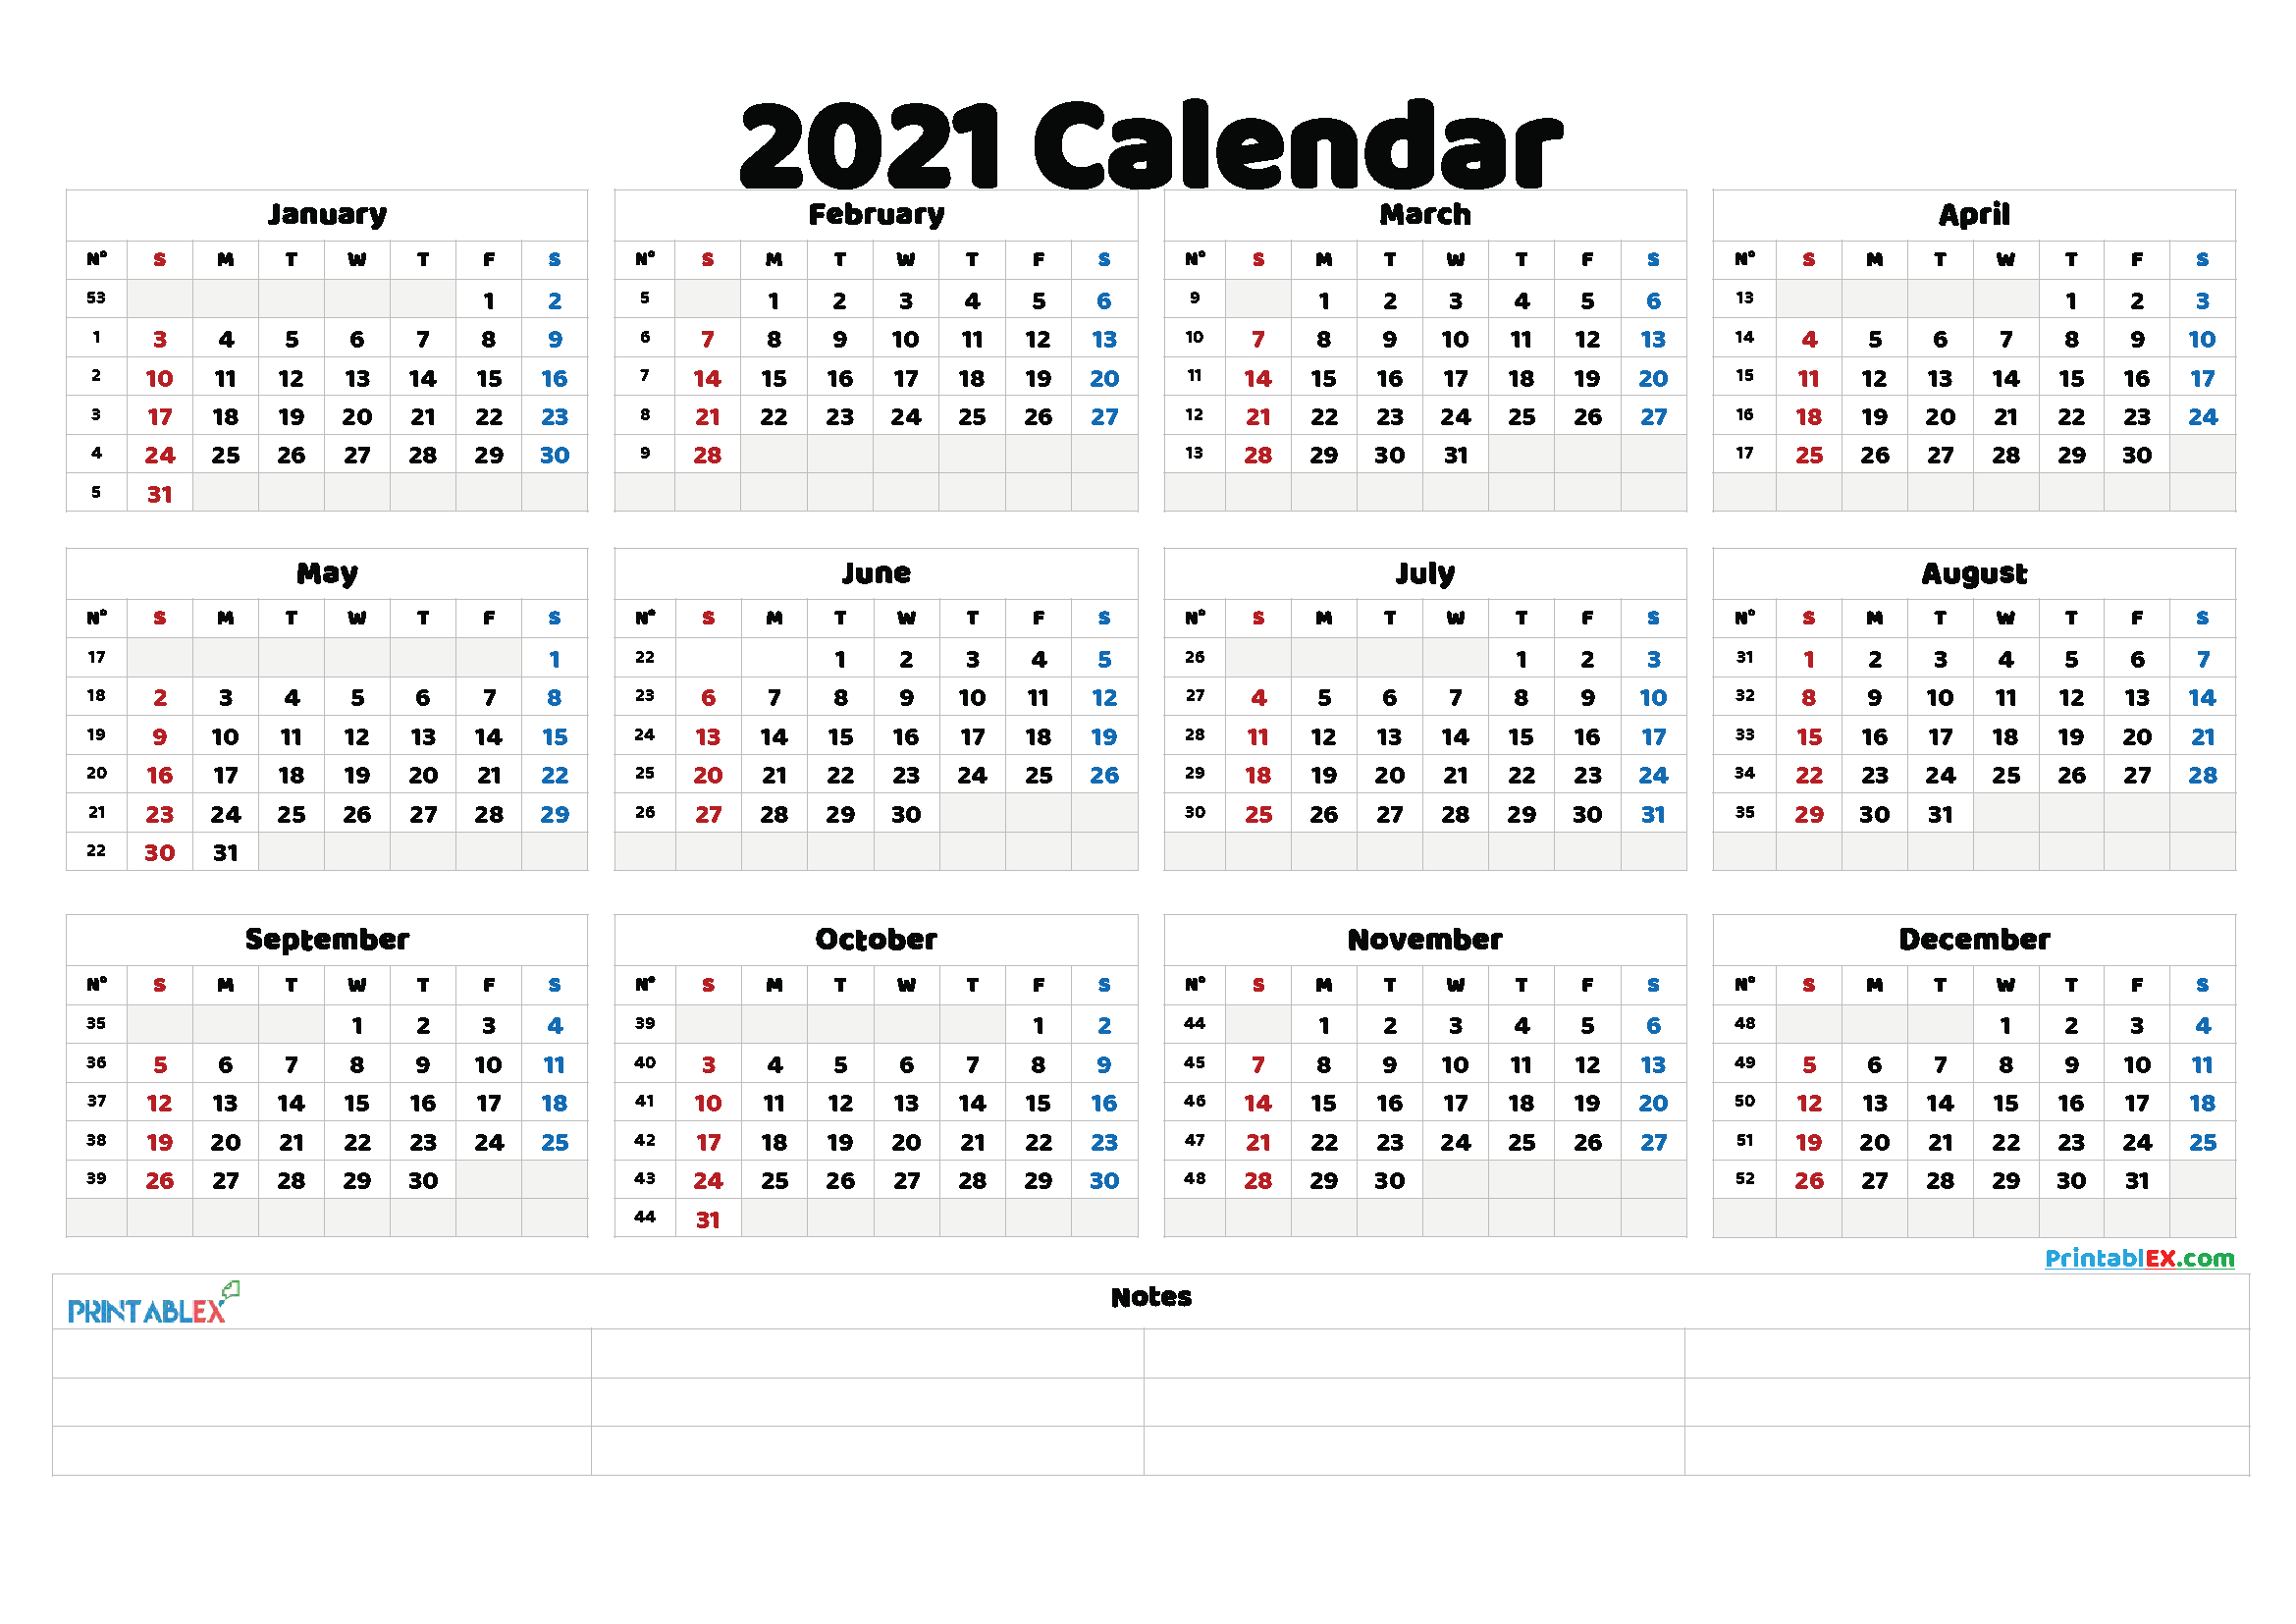 Free Printable 2021 Calendar With Religious Holidays